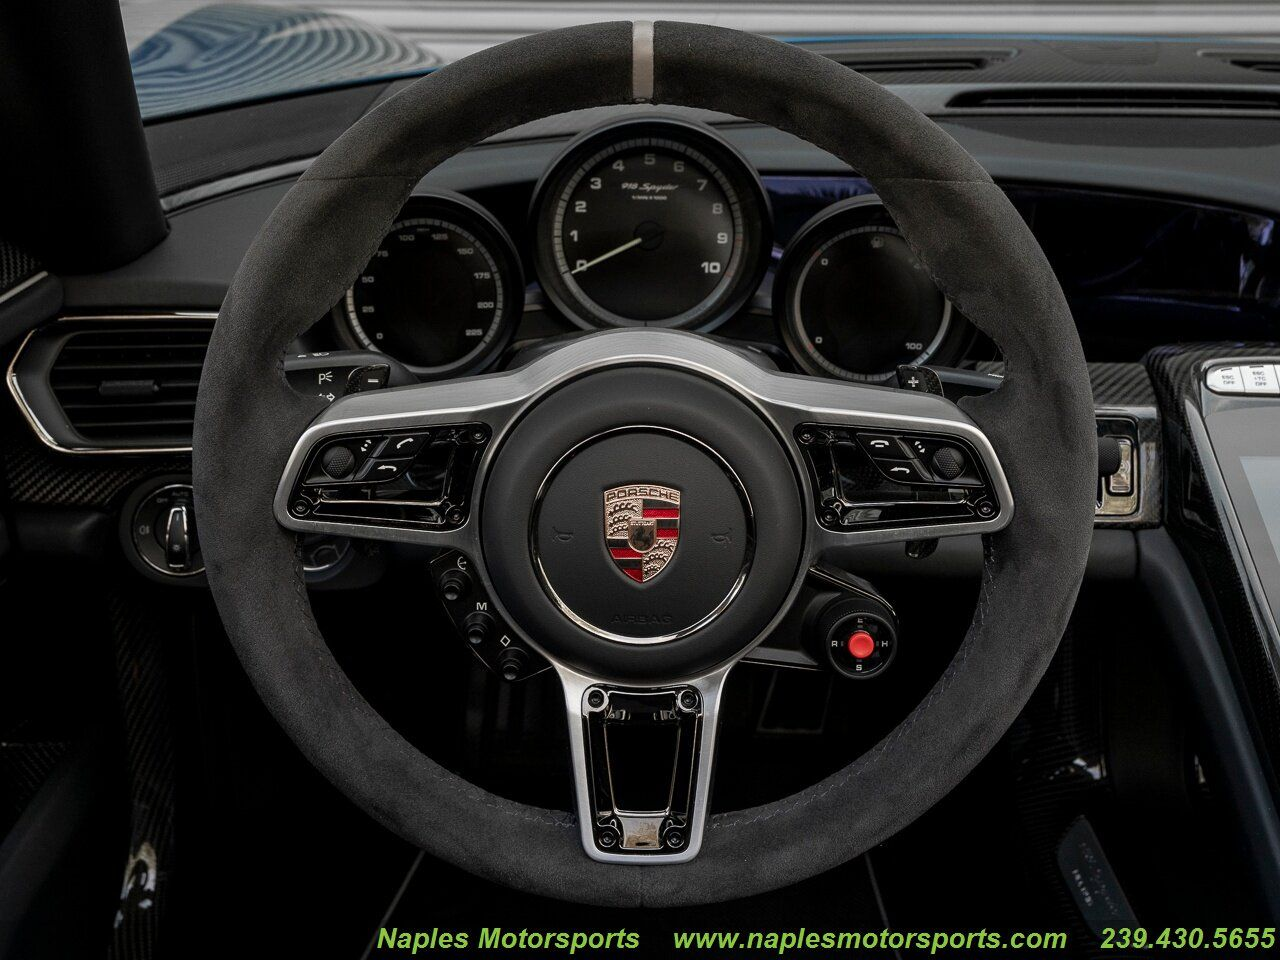 For sale 2015 Porsche 918 Spyder Naples Motorsports